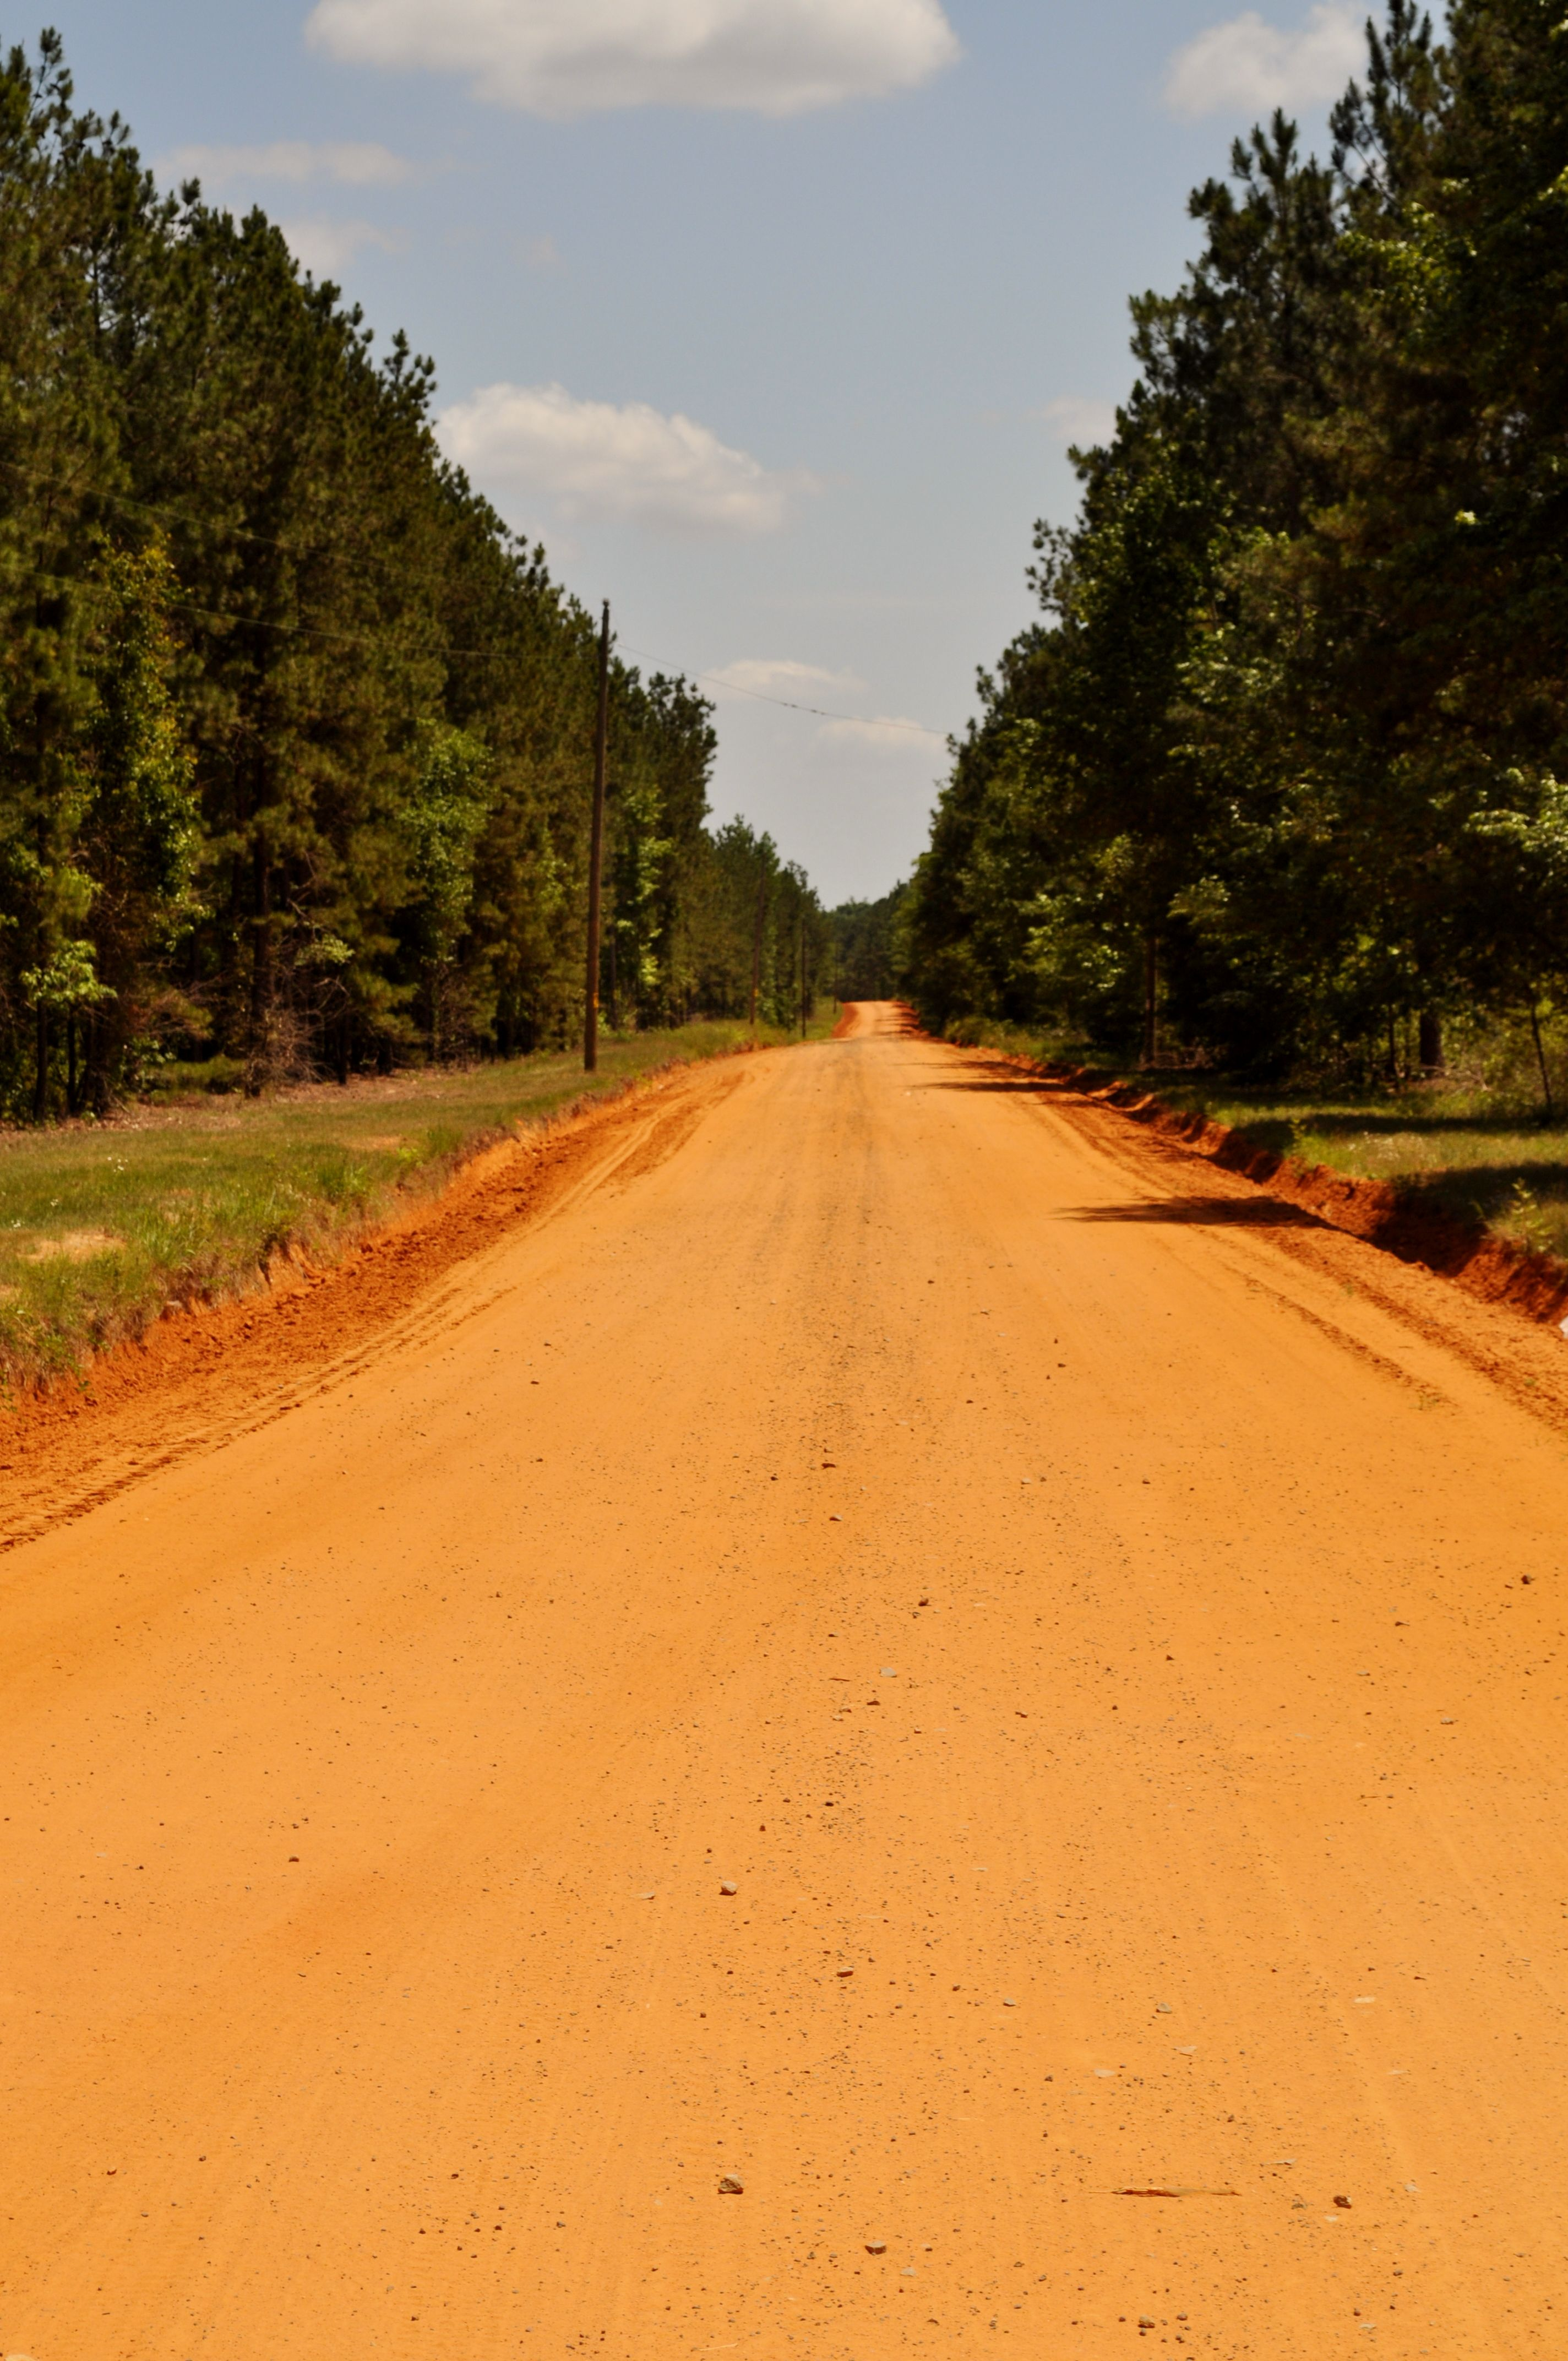 Southern siding augusta ga - Georgia Red Dirt Road Southern Nightsaugusta